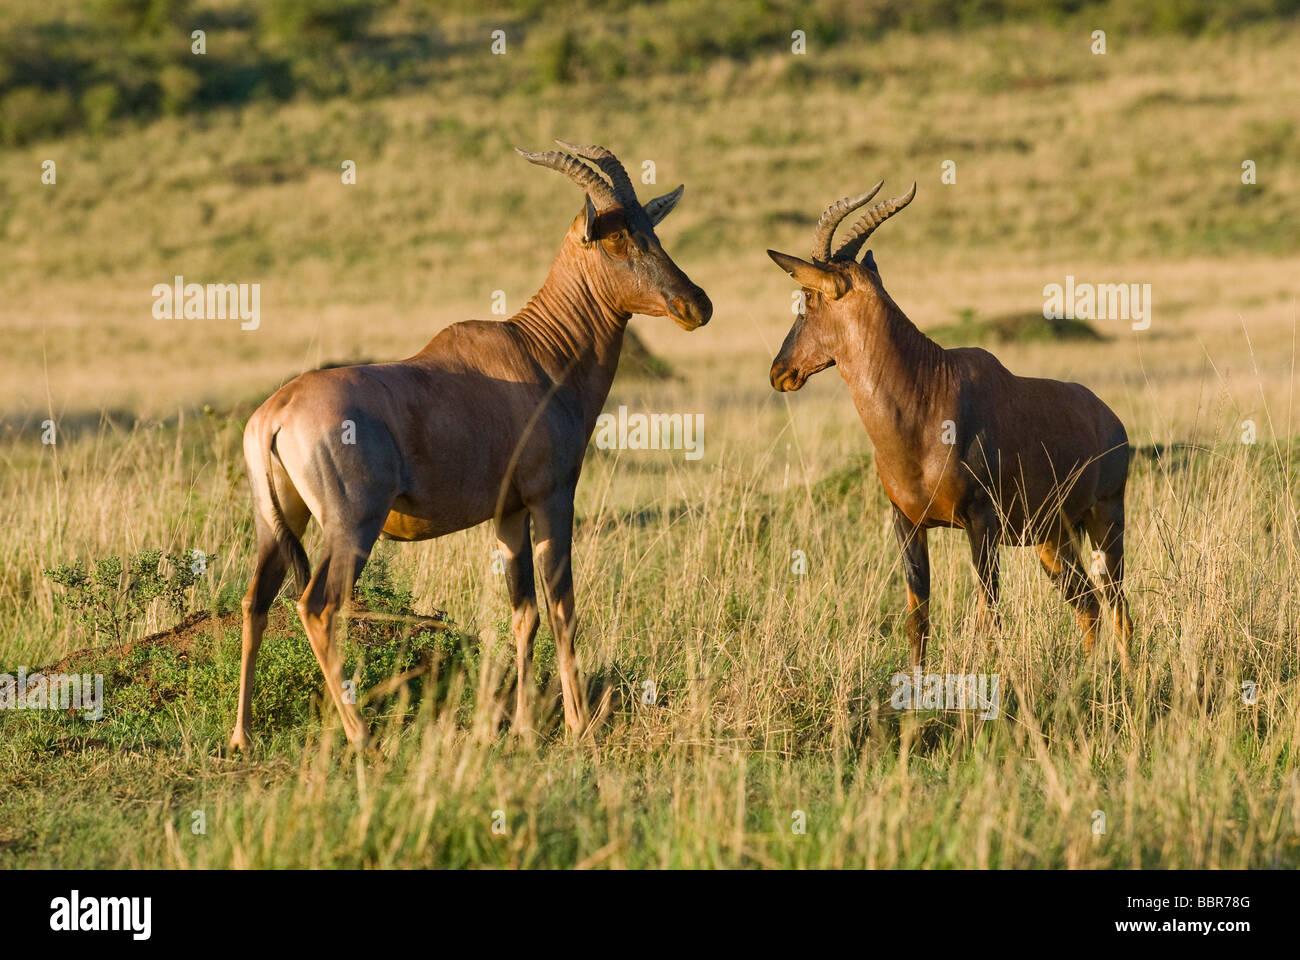 Topi Damaliscus lunatus Masai Mara NATIONAL RESERVE KENYA East Africa - Stock Image